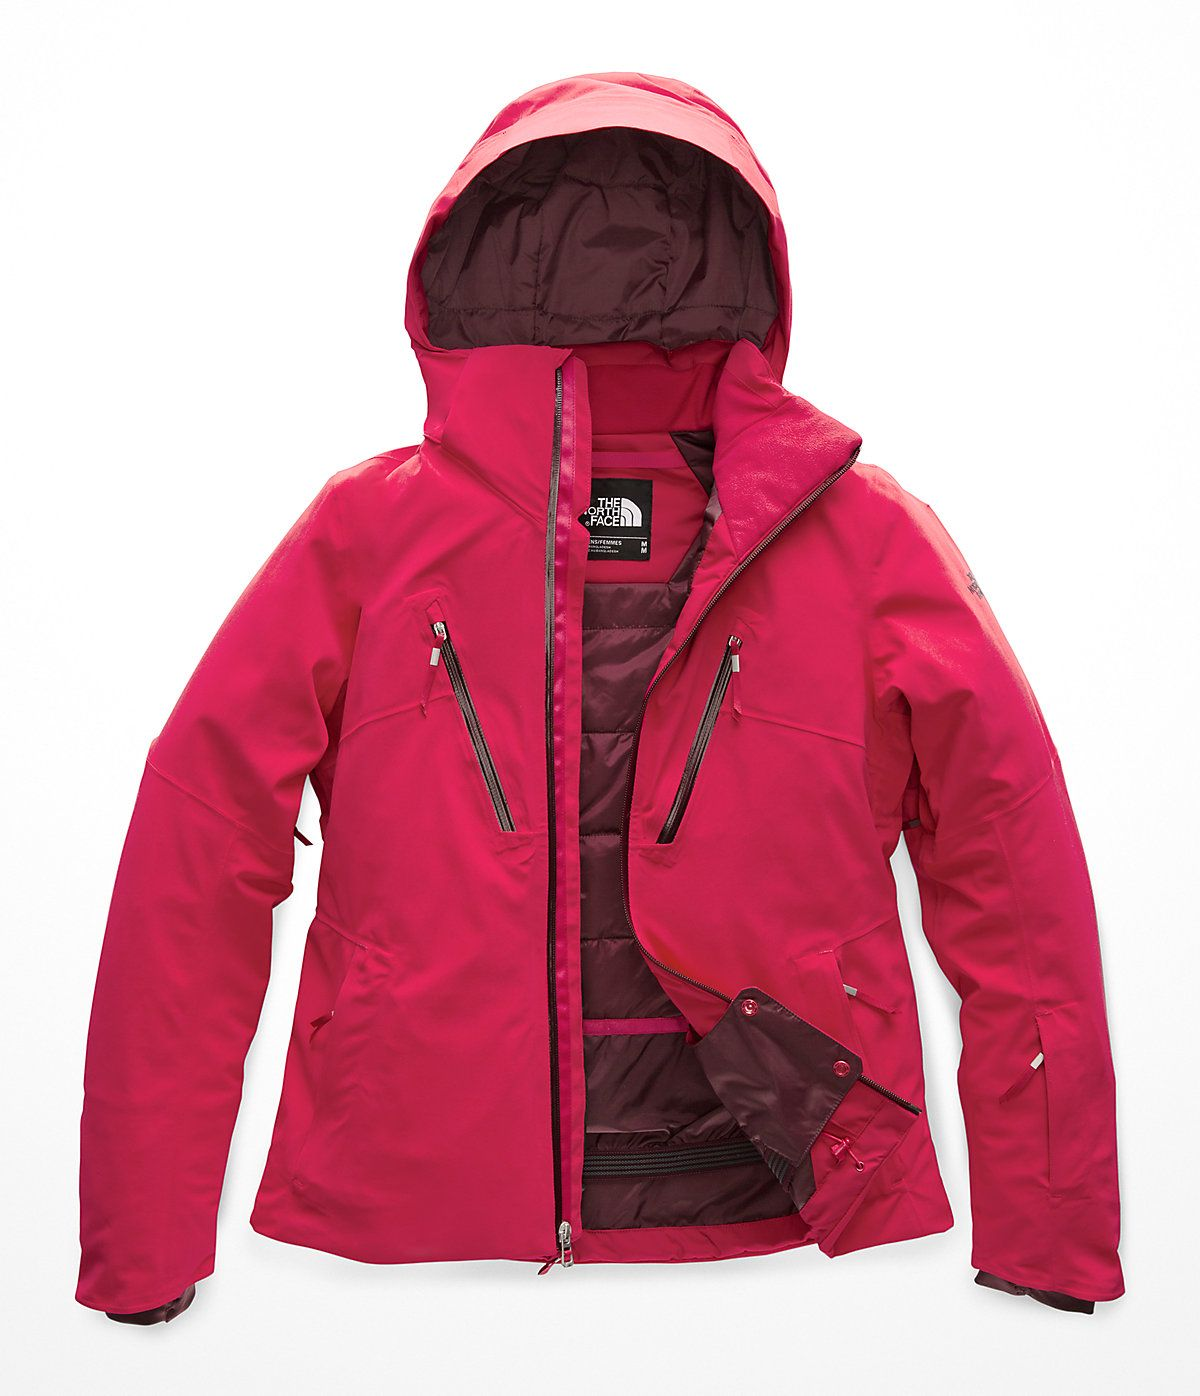 161ebf82a Women's Apex Flex GTX 2L Snow Jacket in 2019 | Products | Jackets ...